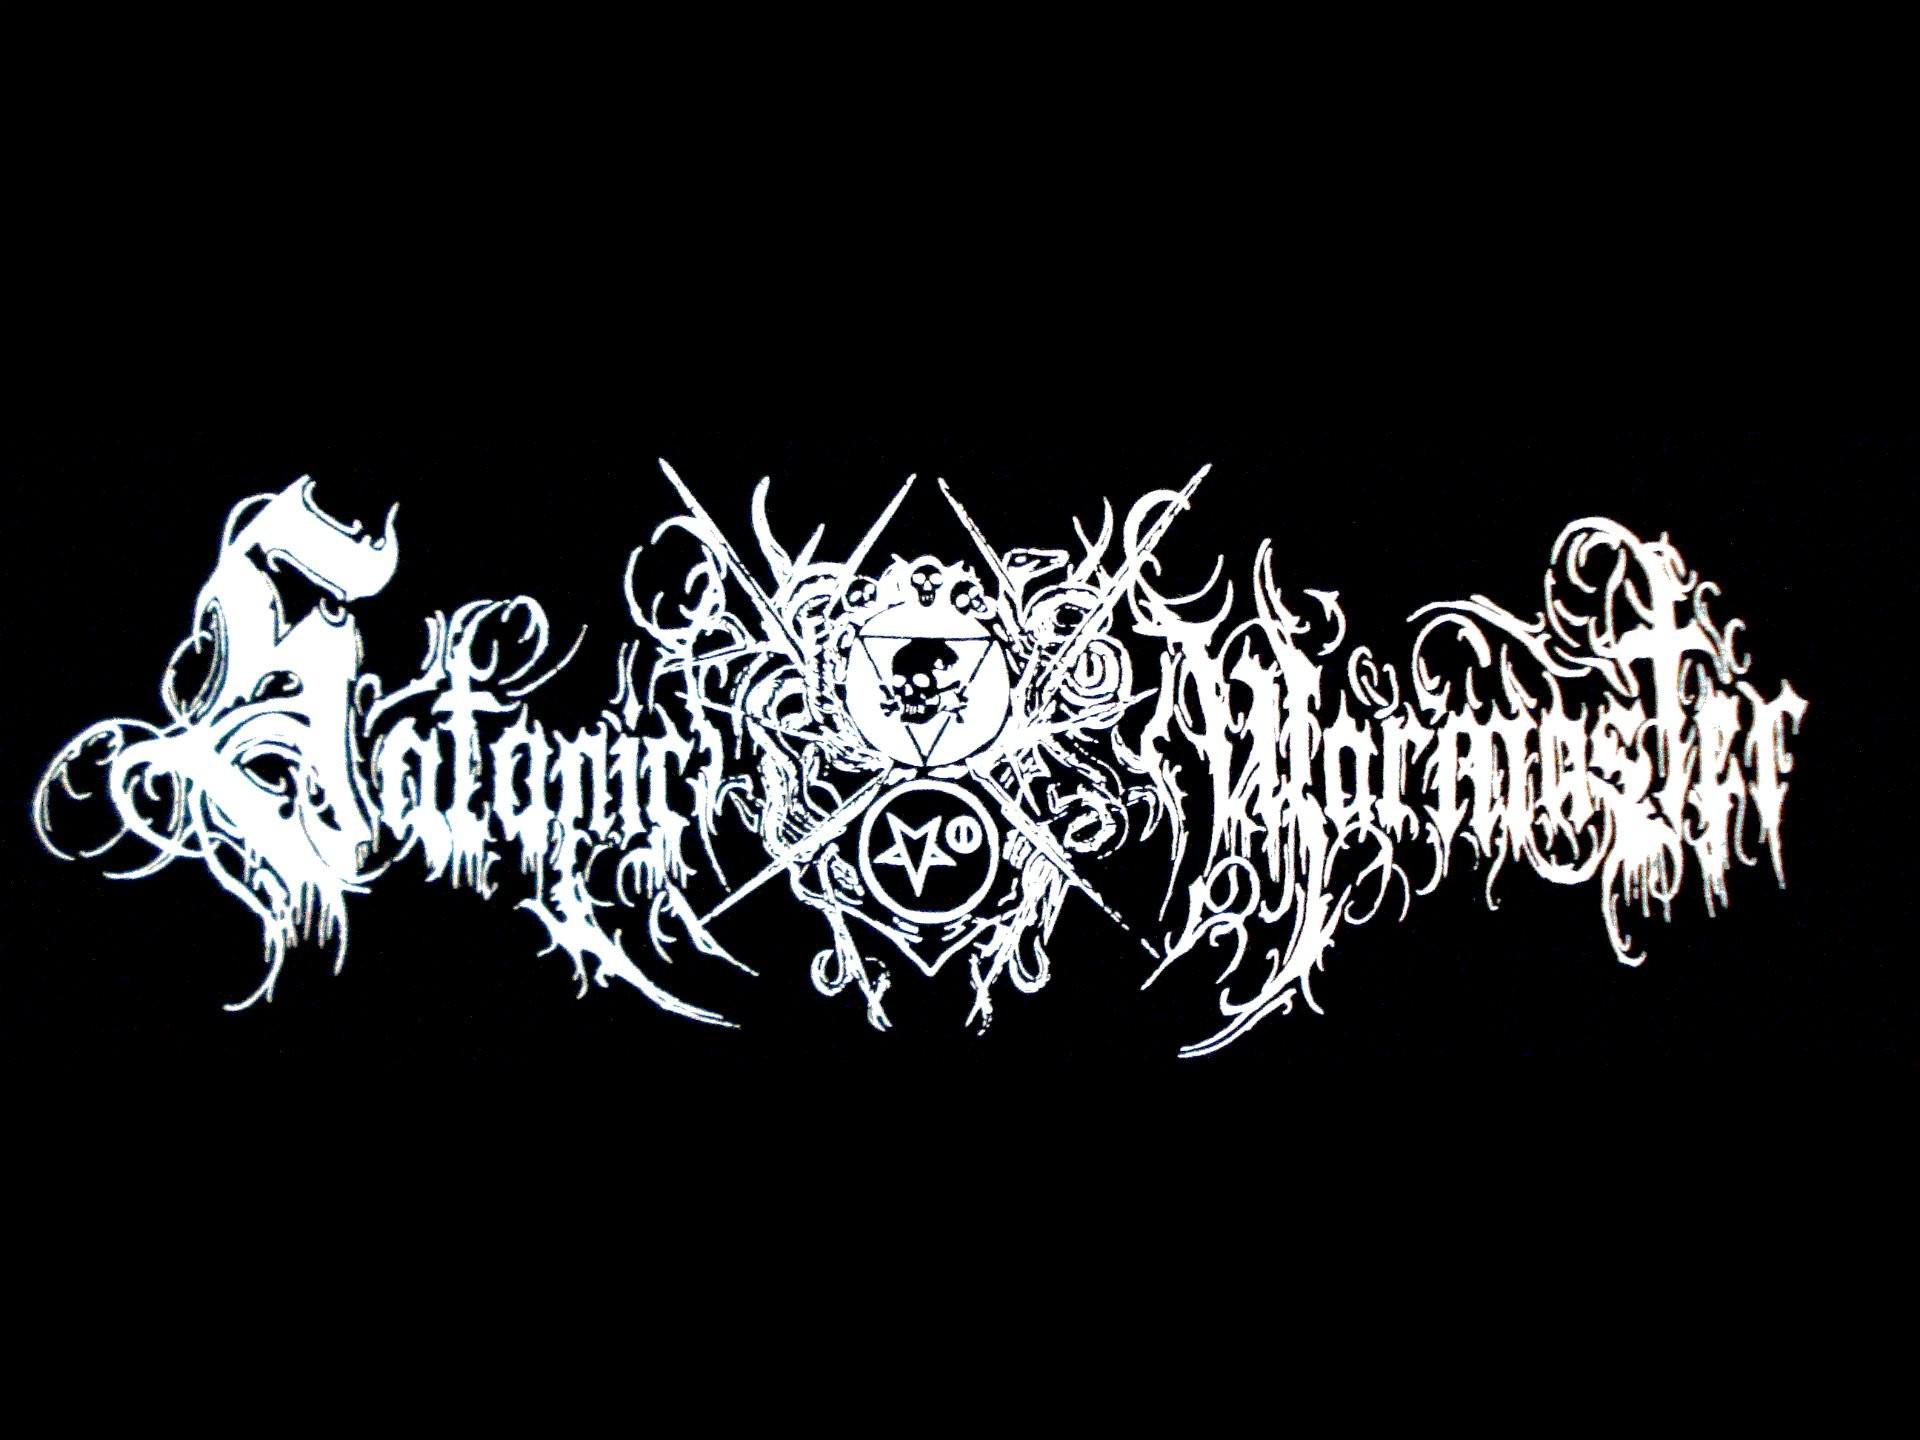 Satanic Iphone Wallpaper Satanic warmaster black metal